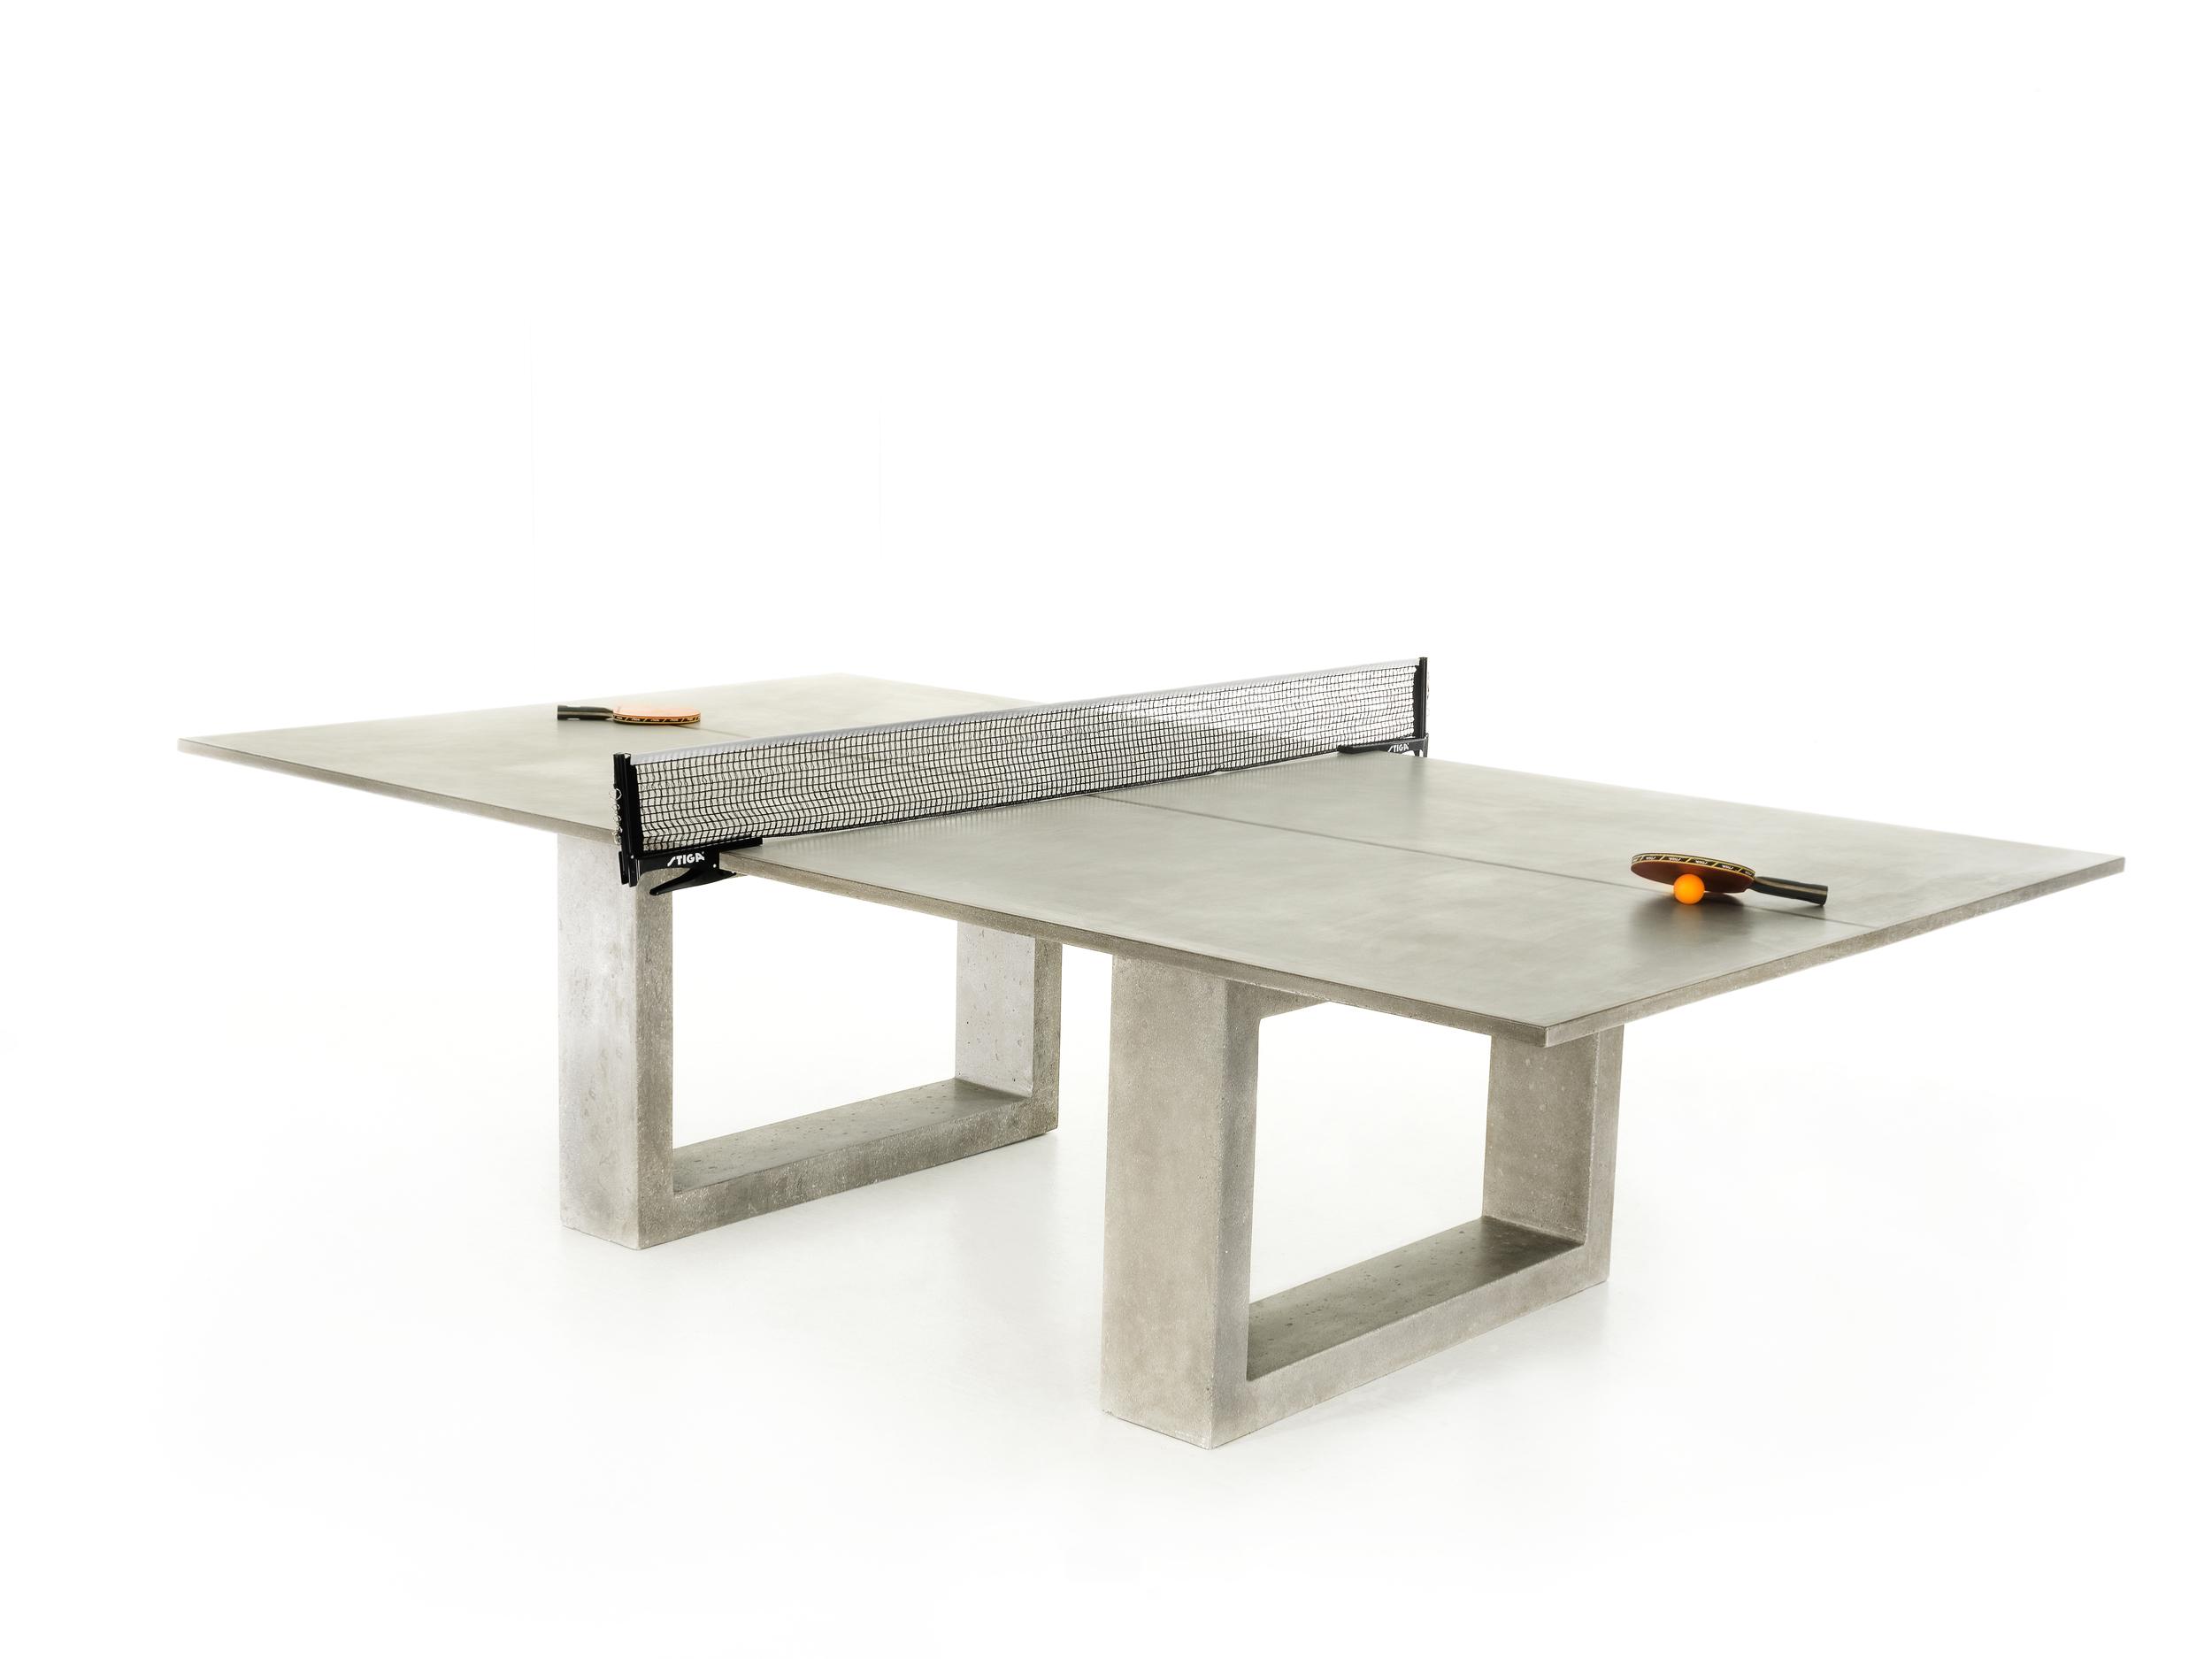 ping pong 1-1.jpg